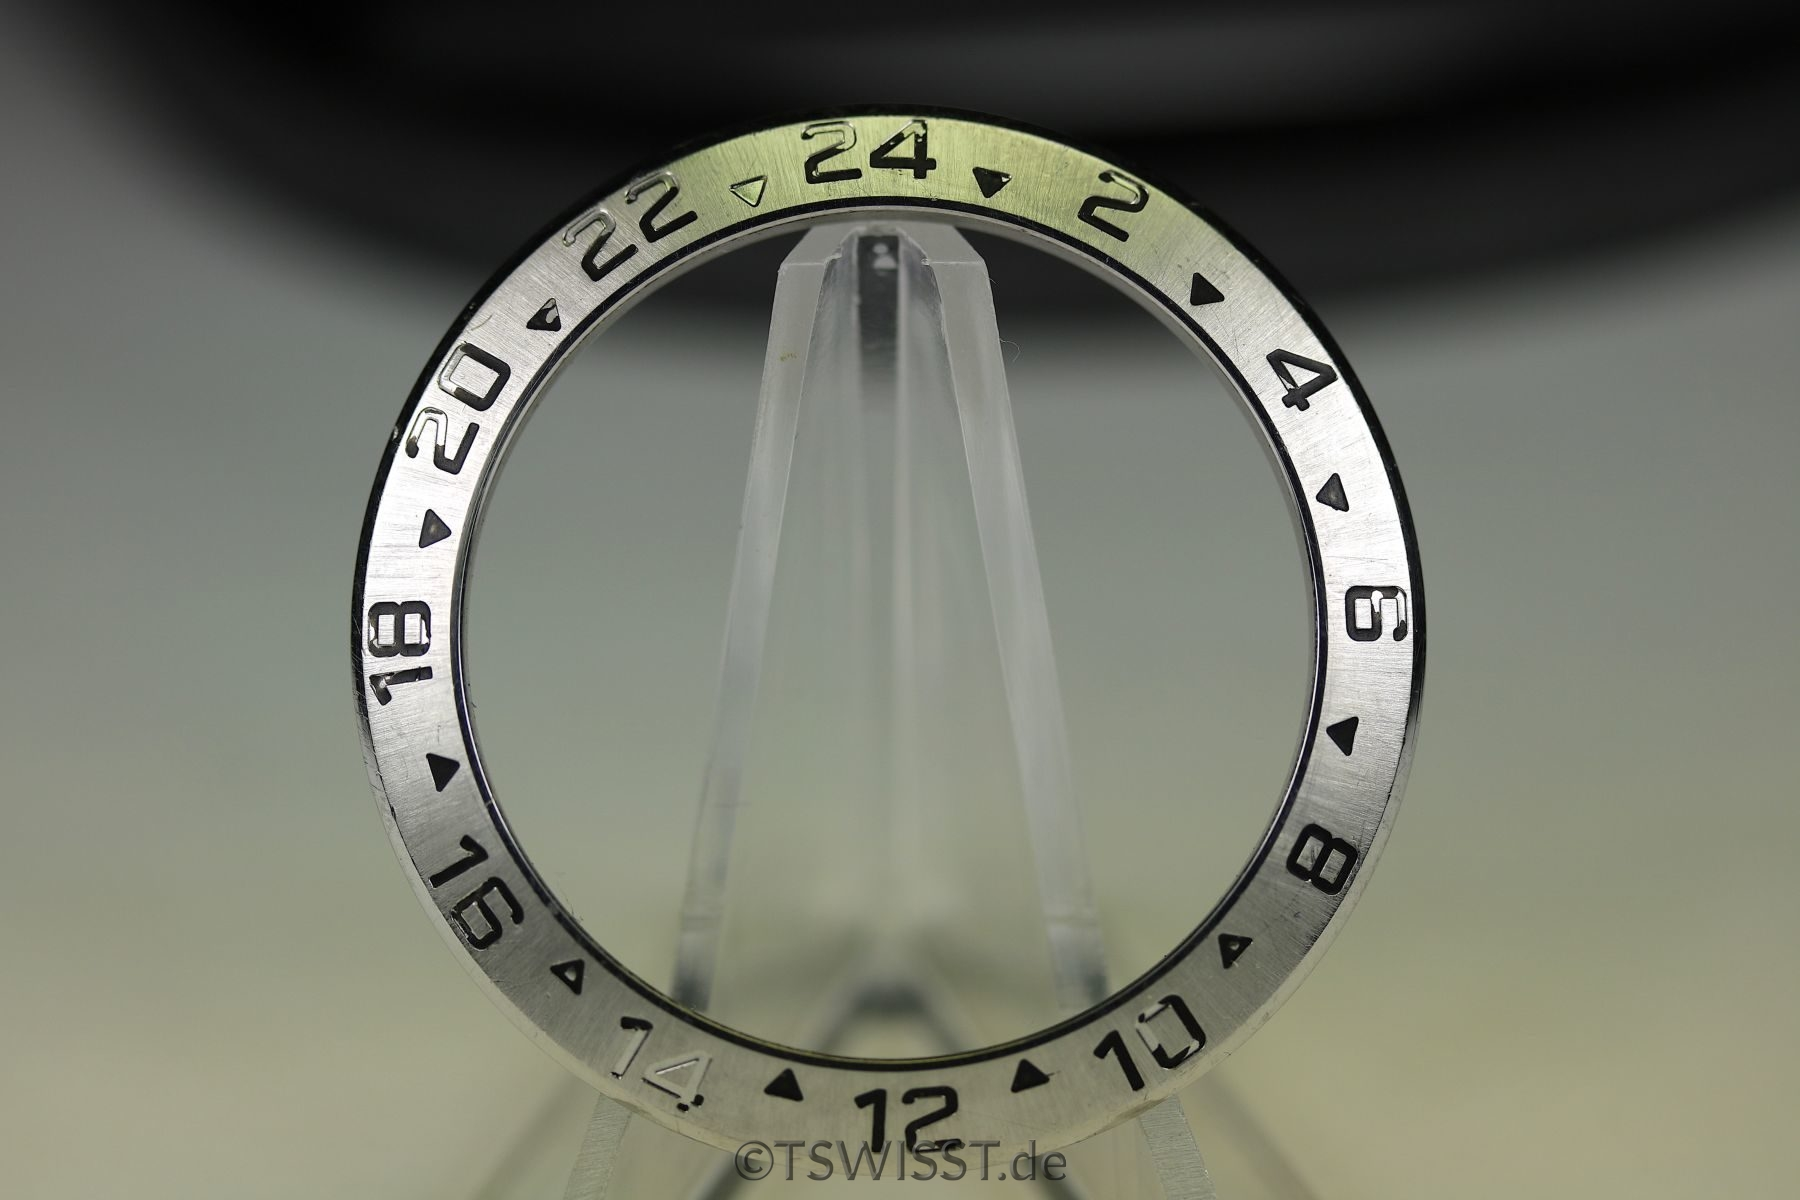 Rolex Explorer bezel